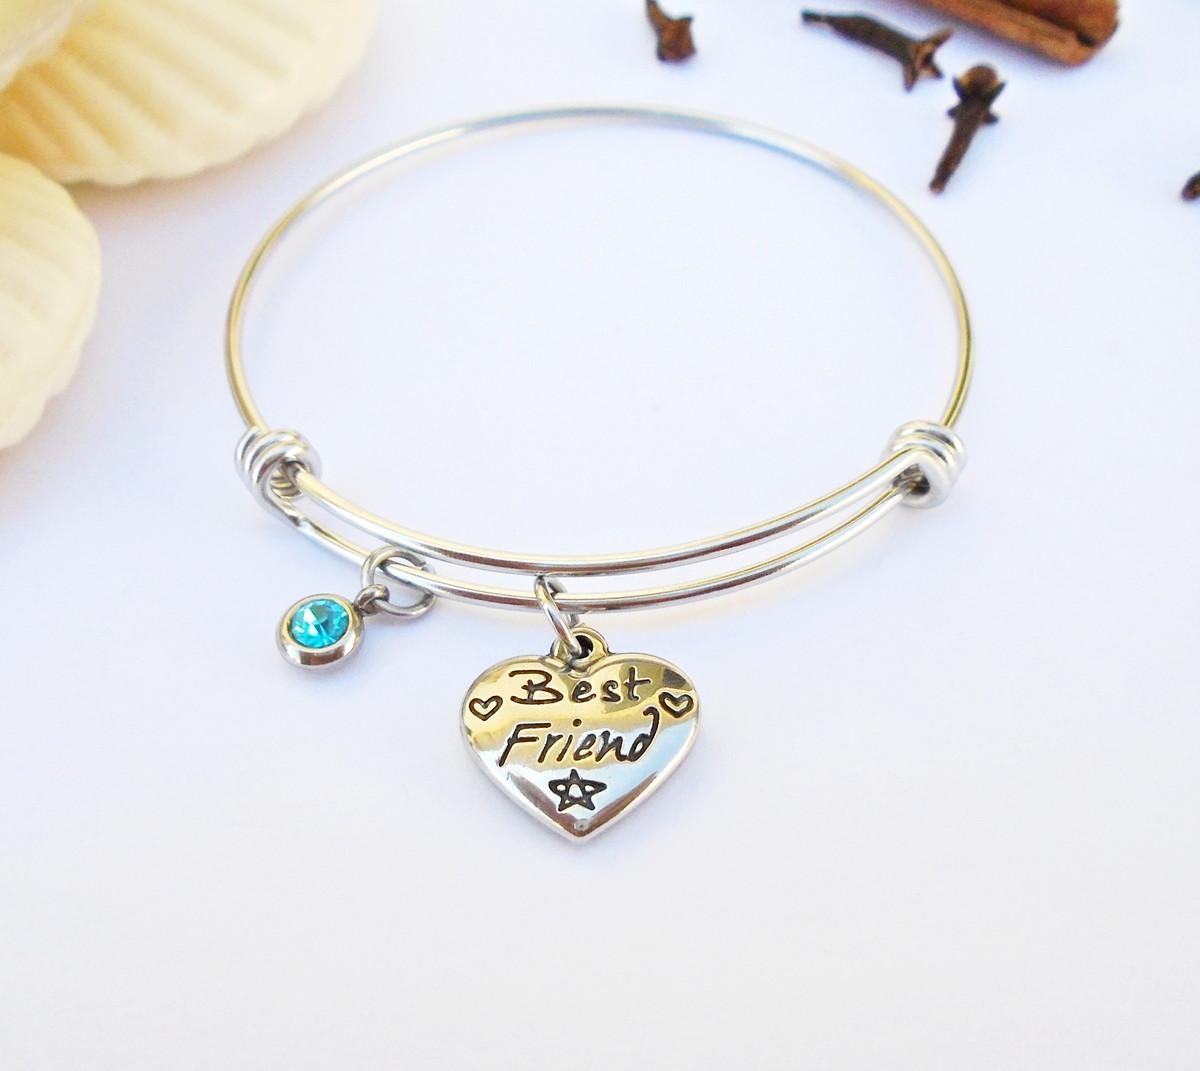 c3d069a667210 Bracelete ARGOLA de Aço Inox 360L BEST FRIENDS Strass Azul no Elo7 ...